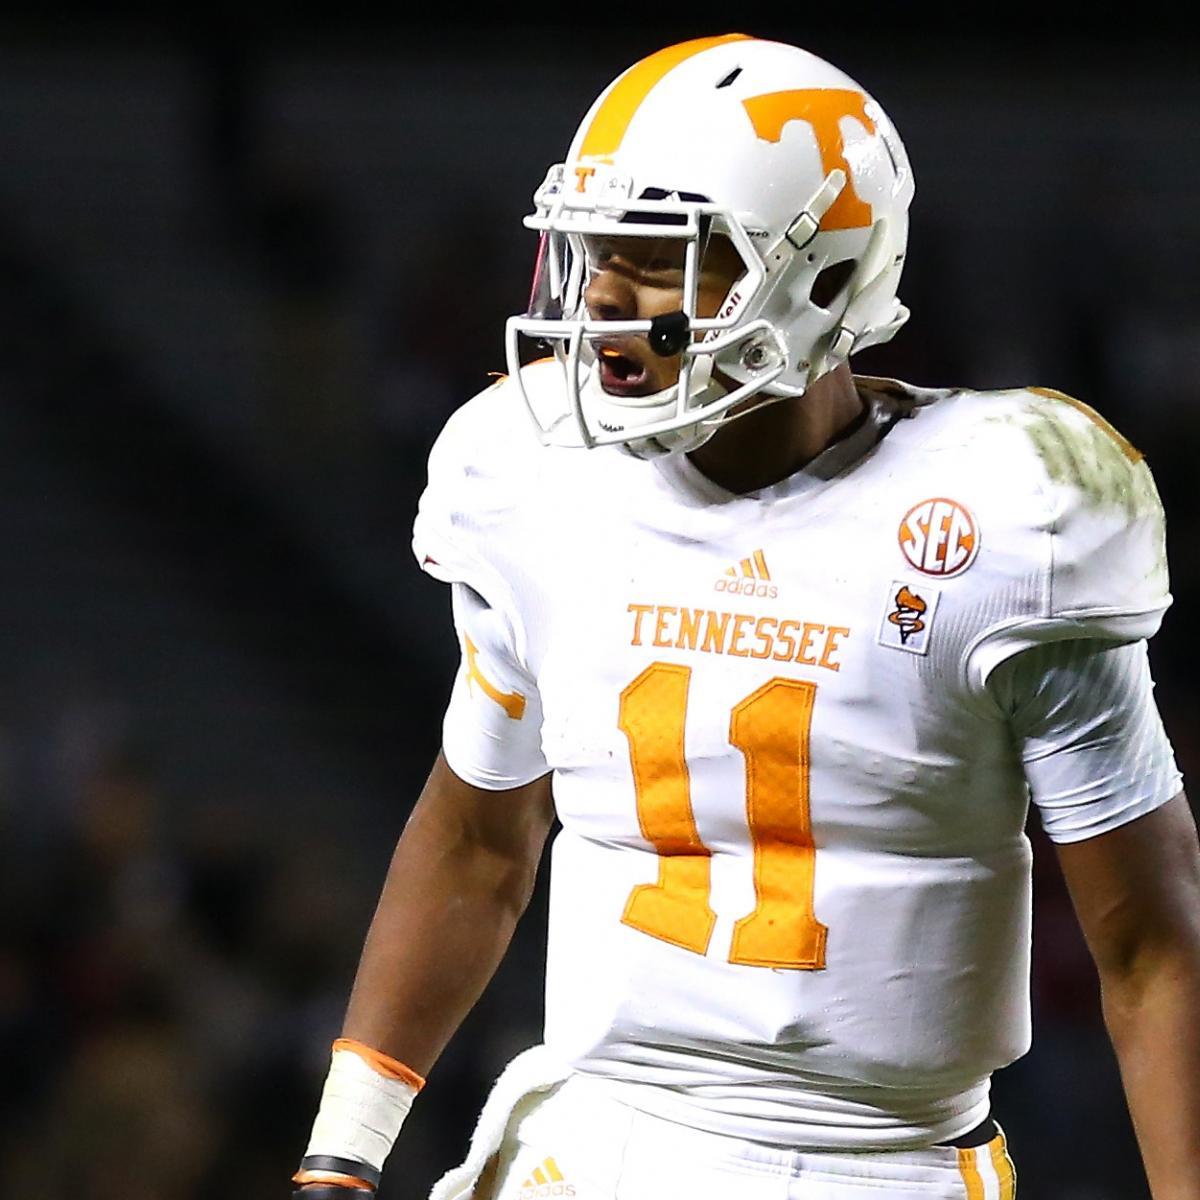 Tennessee Vs. Vanderbilt: Live Score And Highlights